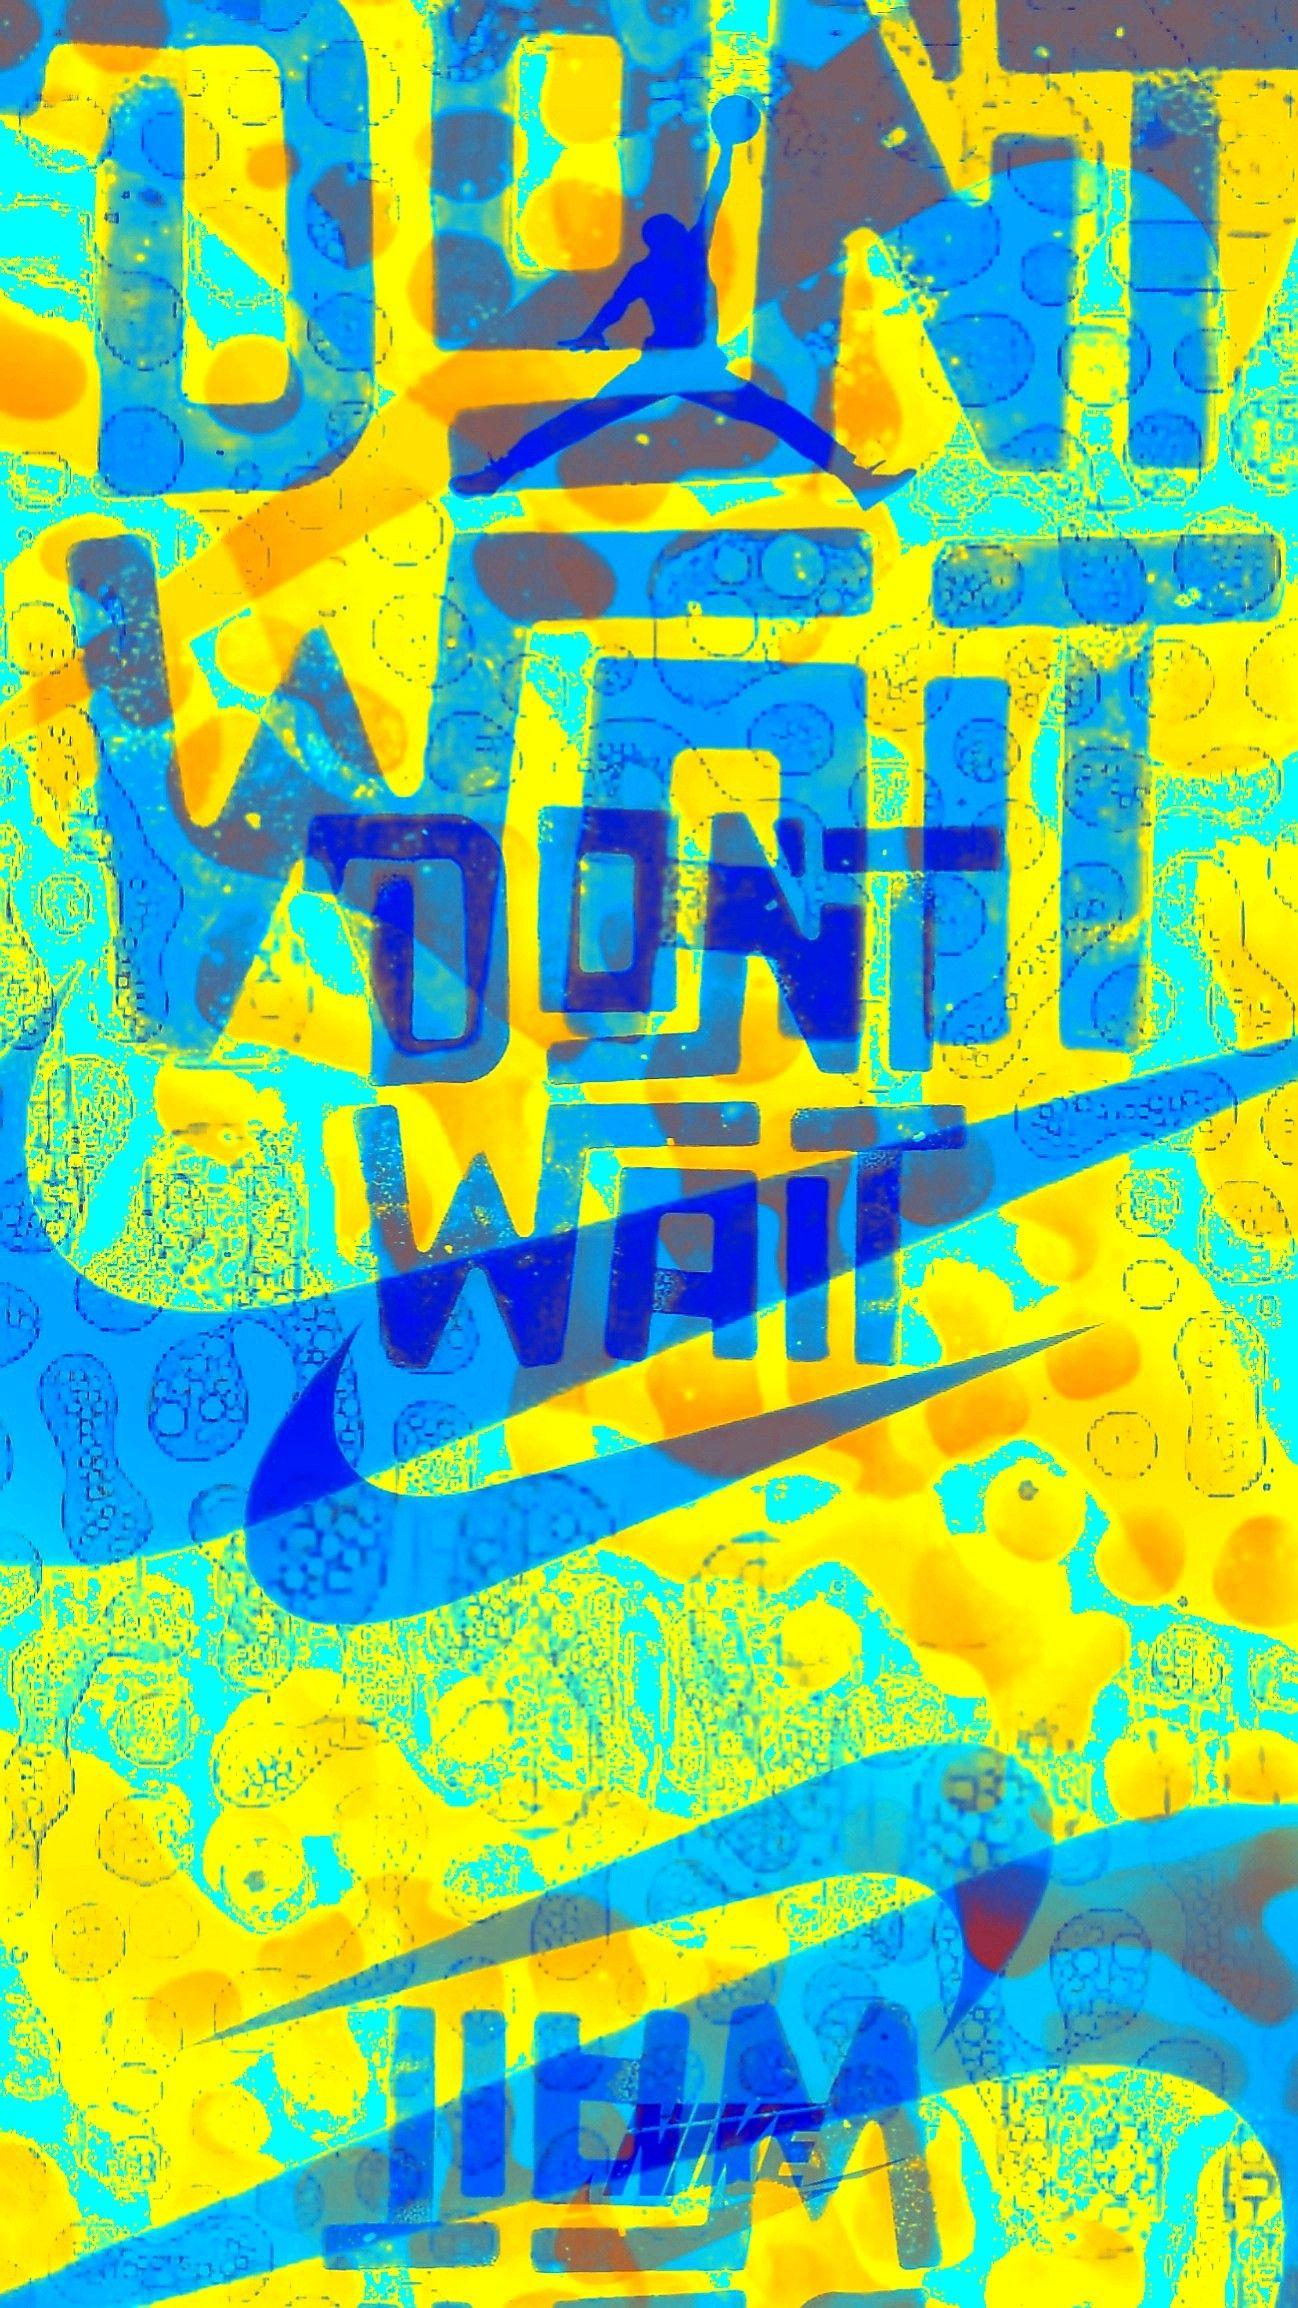 Pin by Randsak on wallpaper in 2020 Nike galaxy, Cool